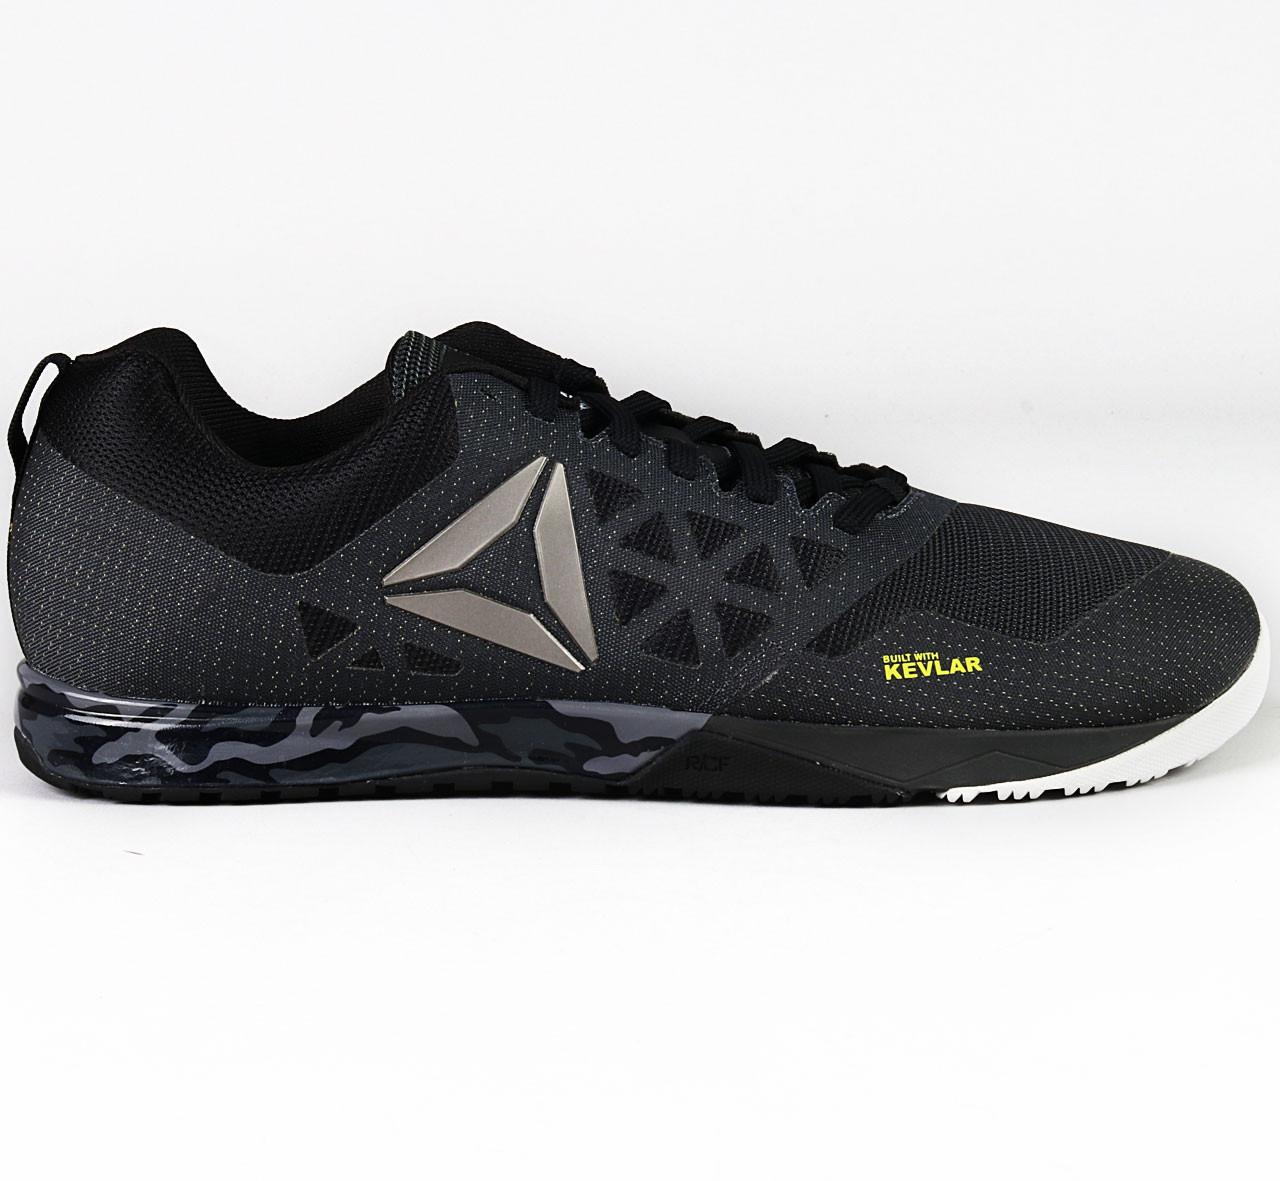 Size 14 Reebok Crossfit Nano 6.0 Training Shoes - Pro Stock Hockey b99c2fea7